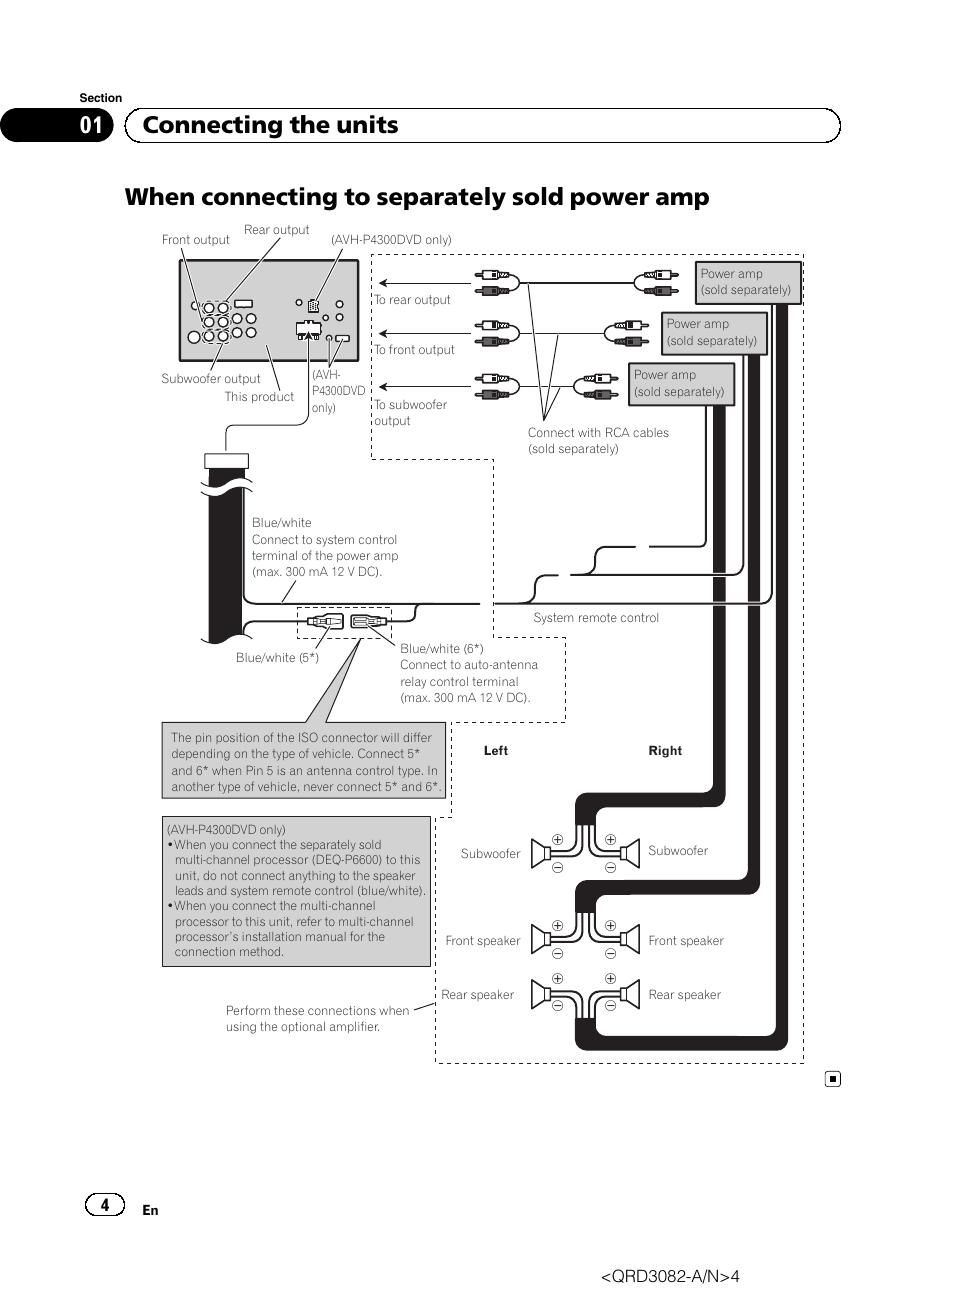 Atemberaubend Pionier Avh P8400bh Schaltplan Ideen - Elektrische ...